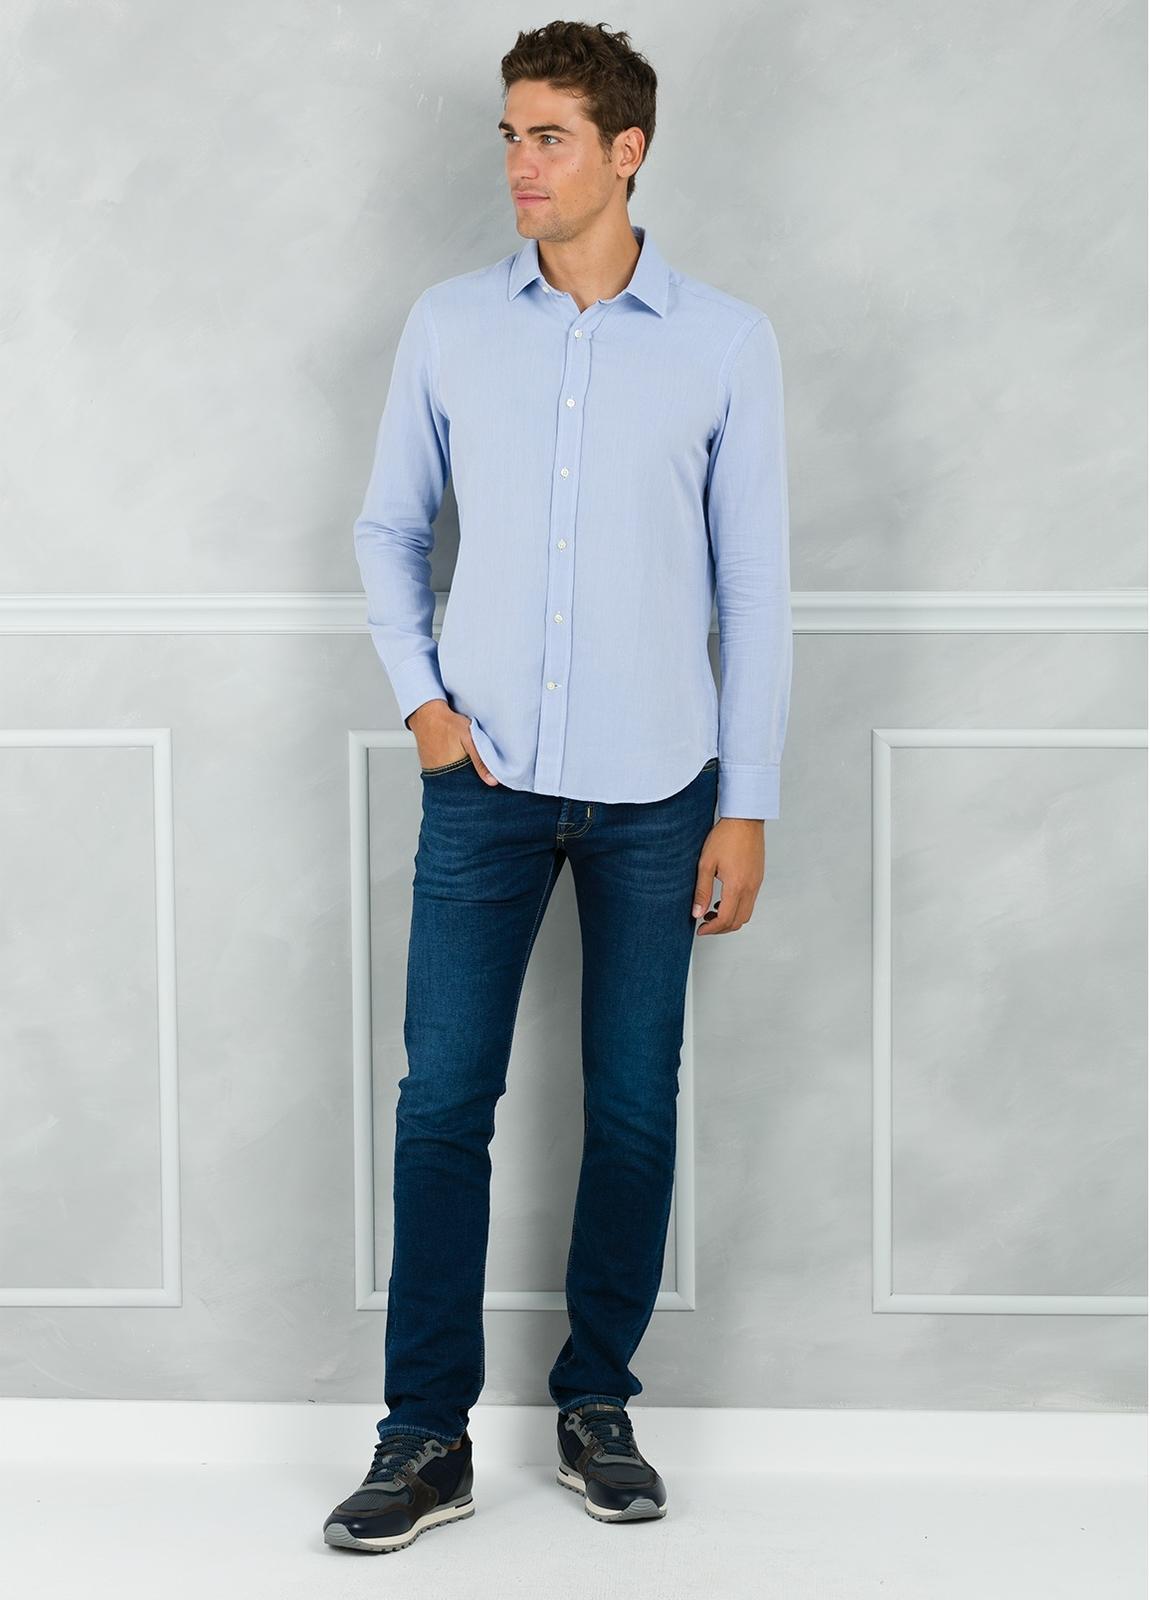 Camisa Leisure Wear REGULAR FIT modelo PORTO color azul. 100% Algodón. - Ítem2